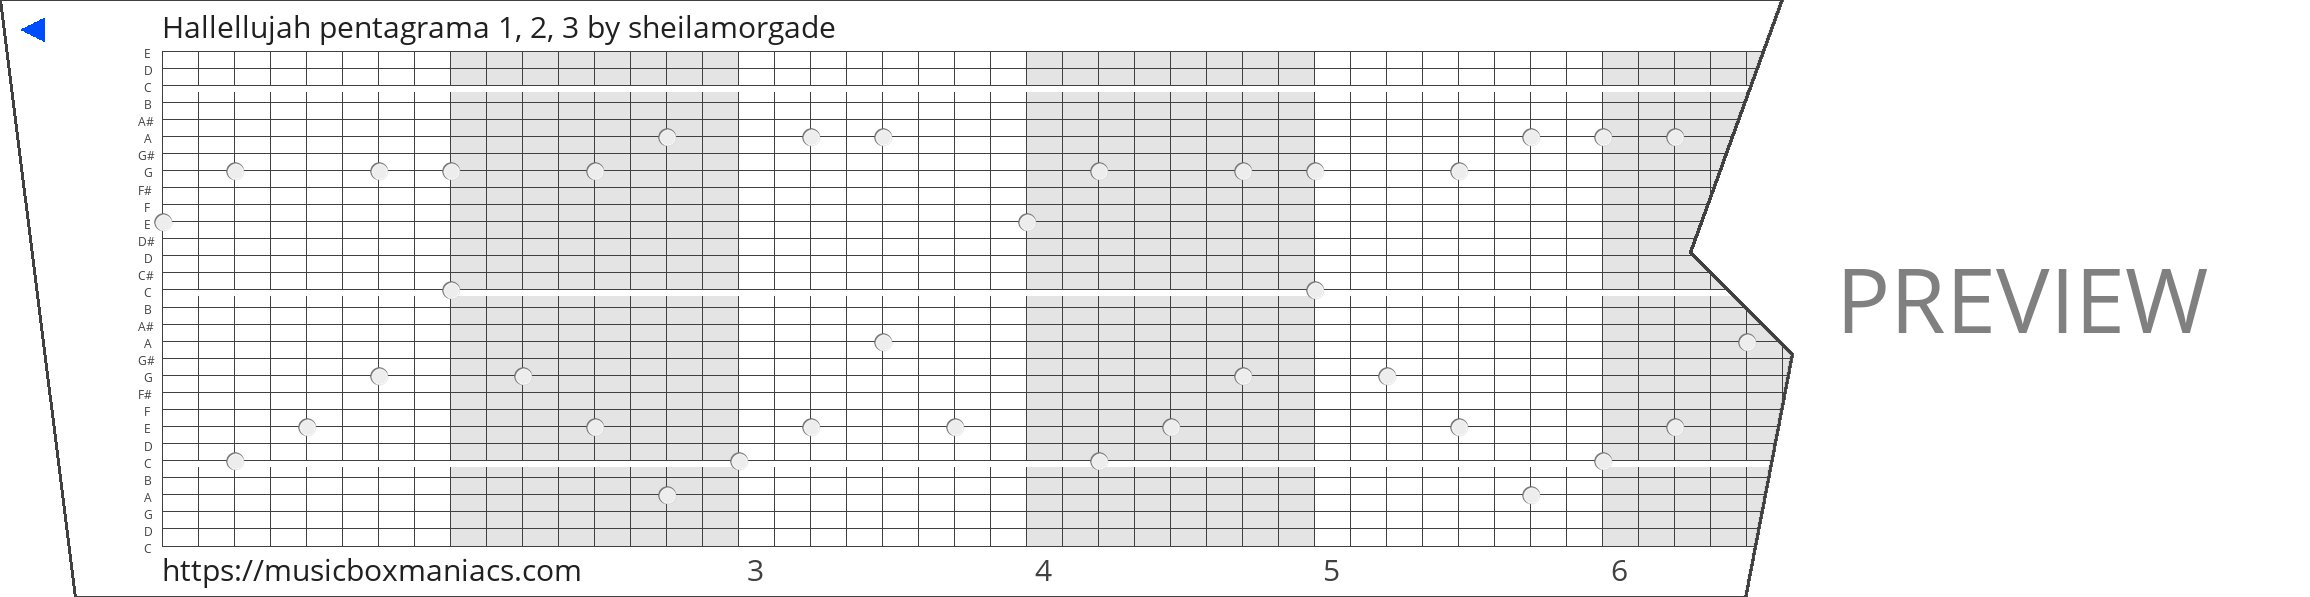 Hallellujah pentagrama 1, 2, 3 30 note music box paper strip